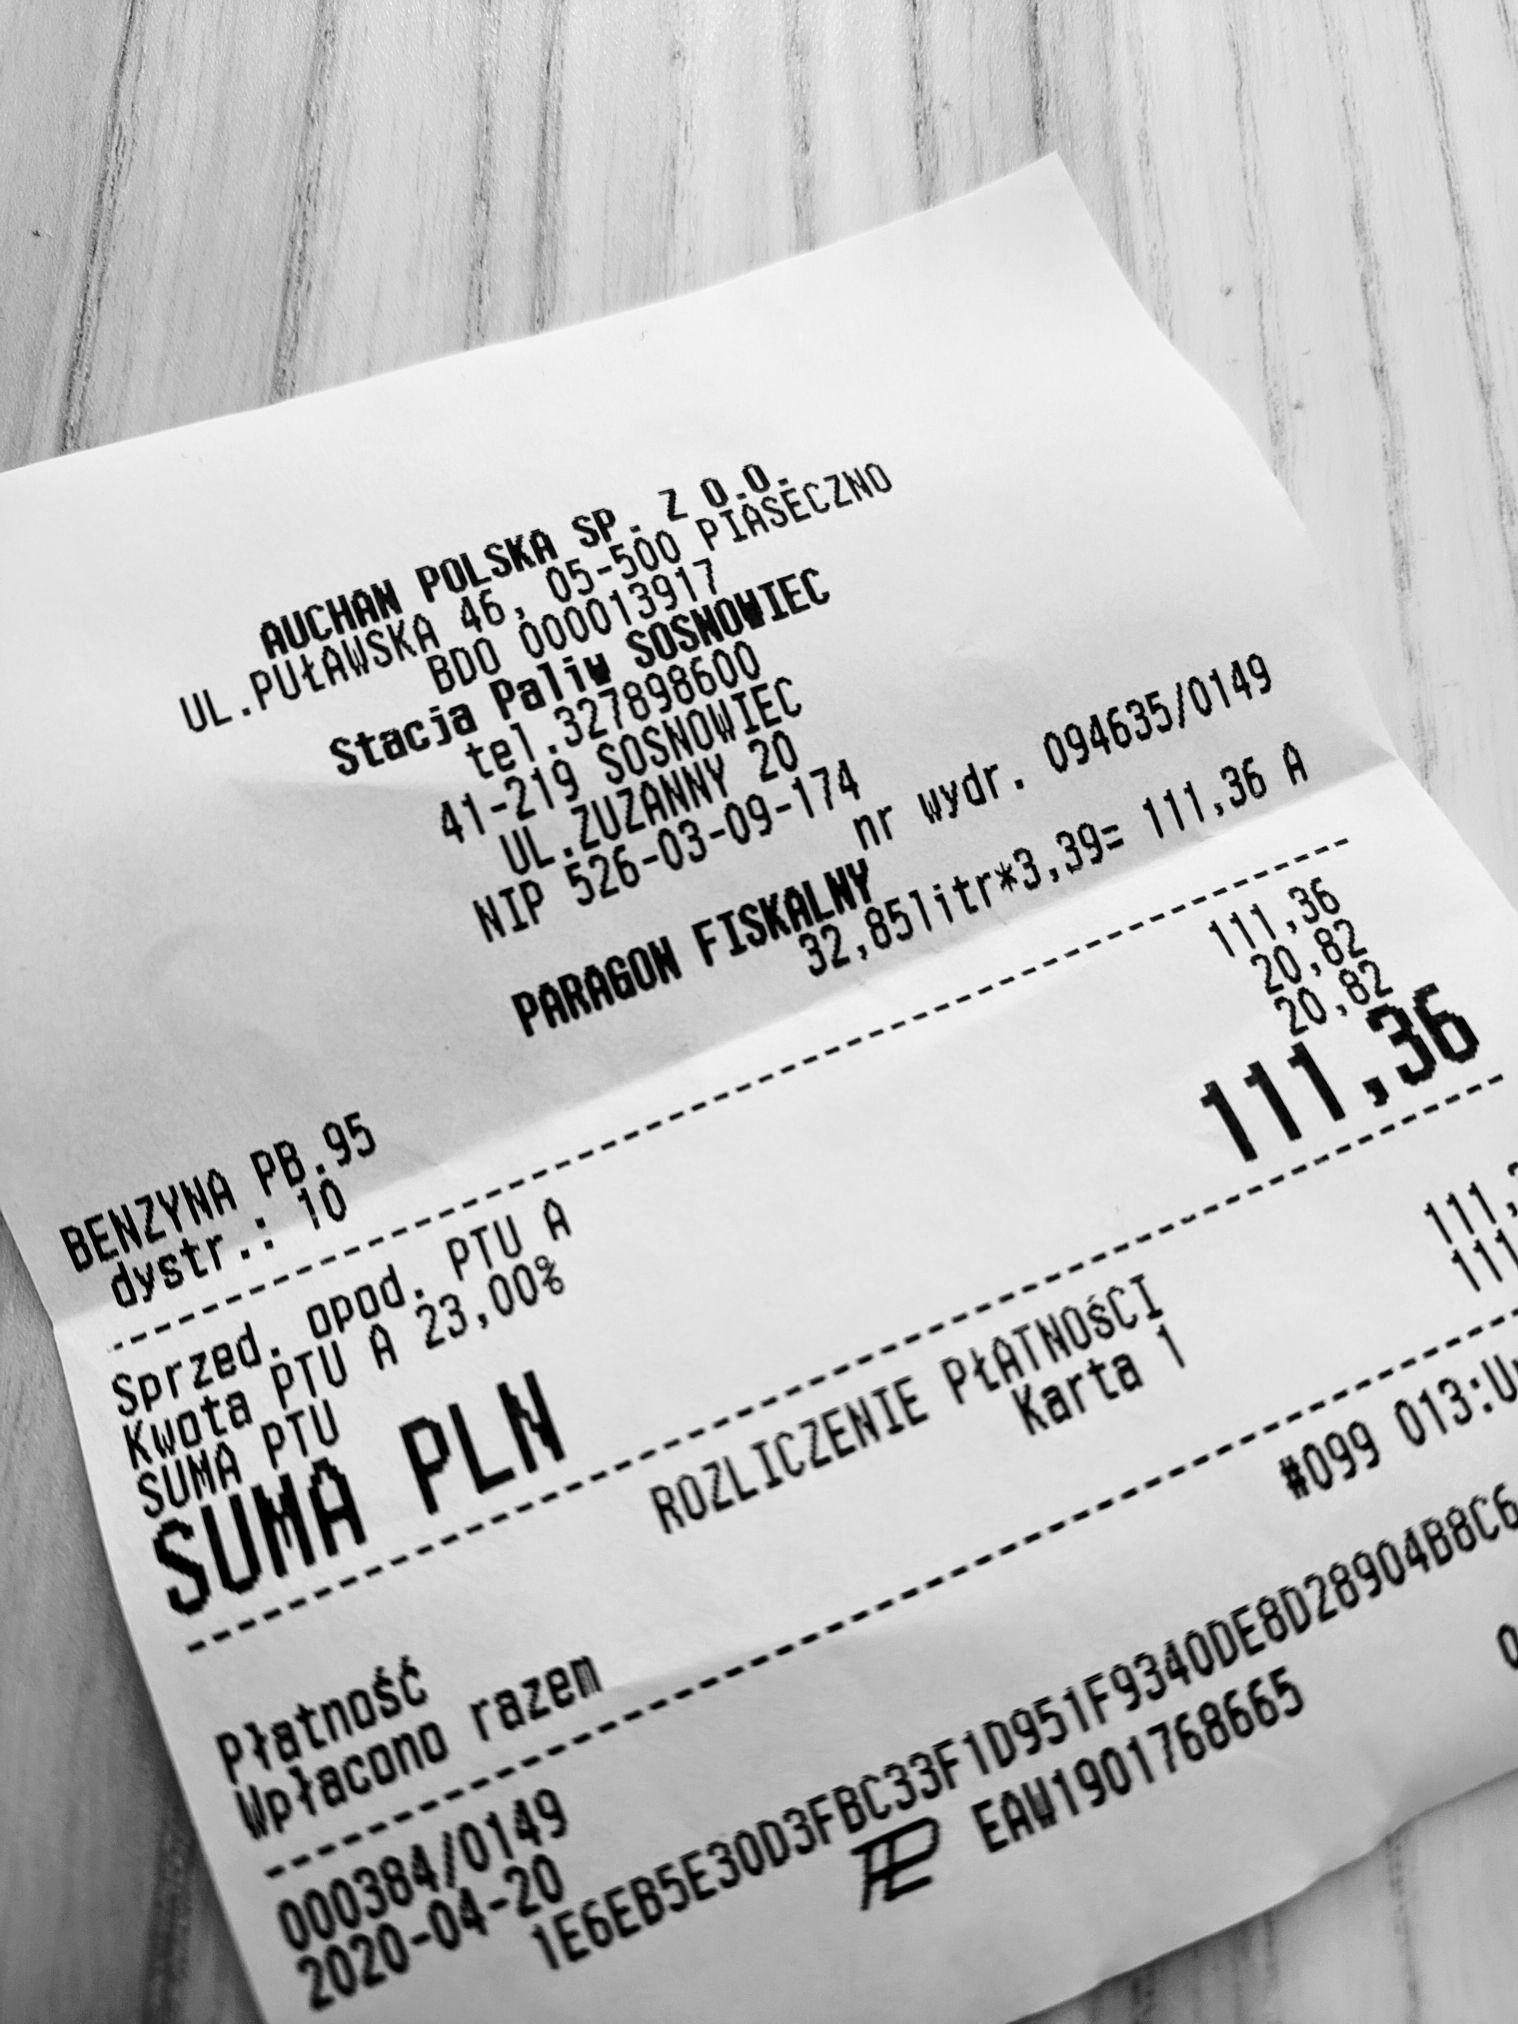 Auchan Sosnowiec Paliwo, Pb95 3,35, Pb98 3,48, ON 3,49, LPG 1,49